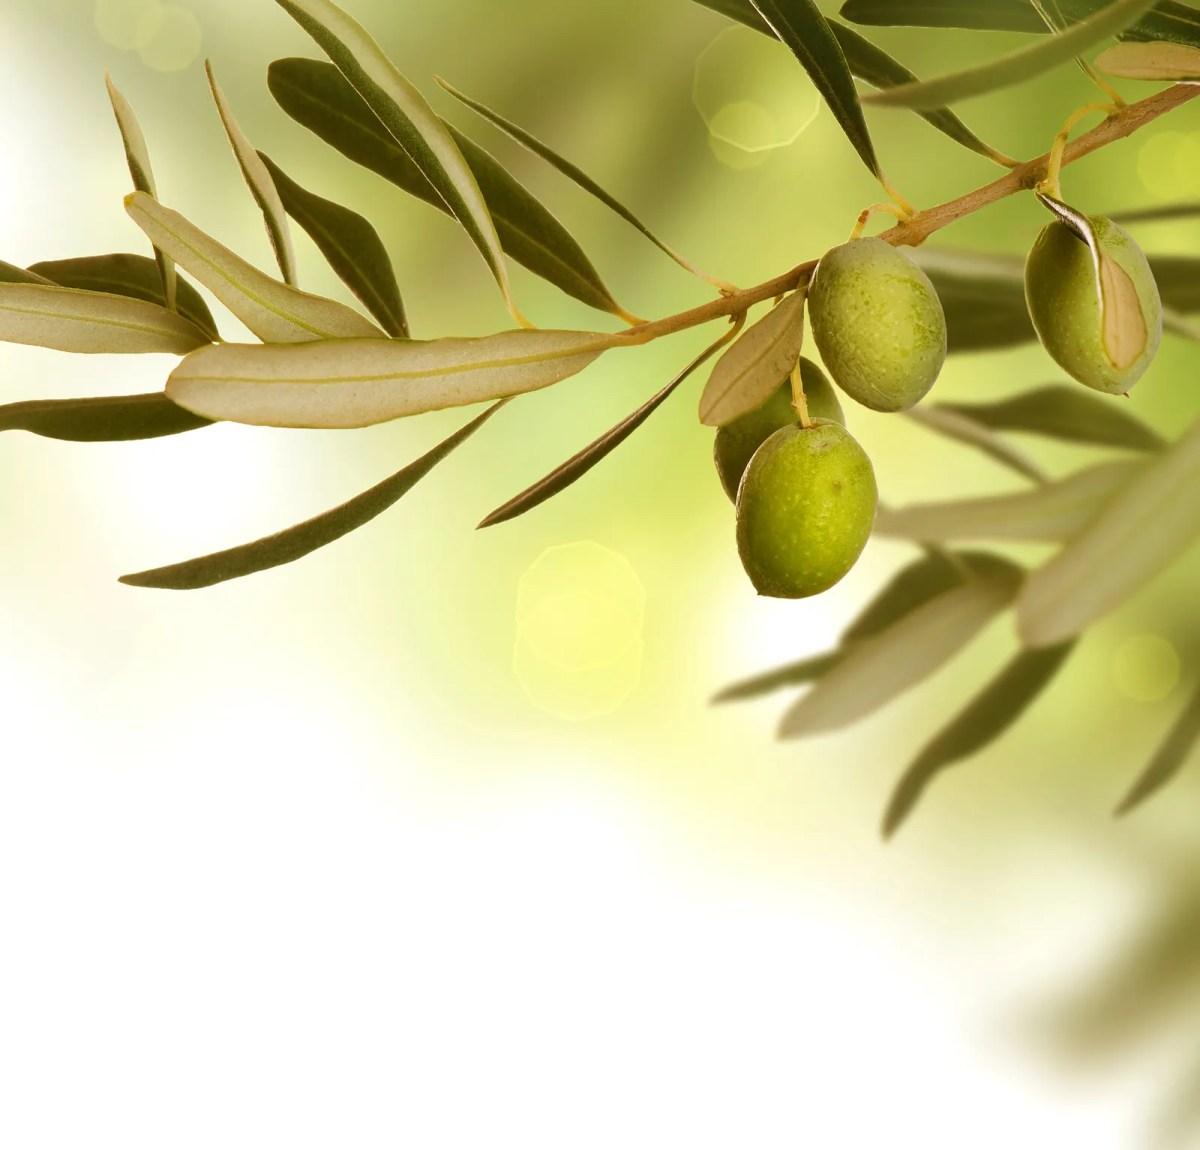 Olivenblade - E - Coli og Salmonella - Nej Tak!